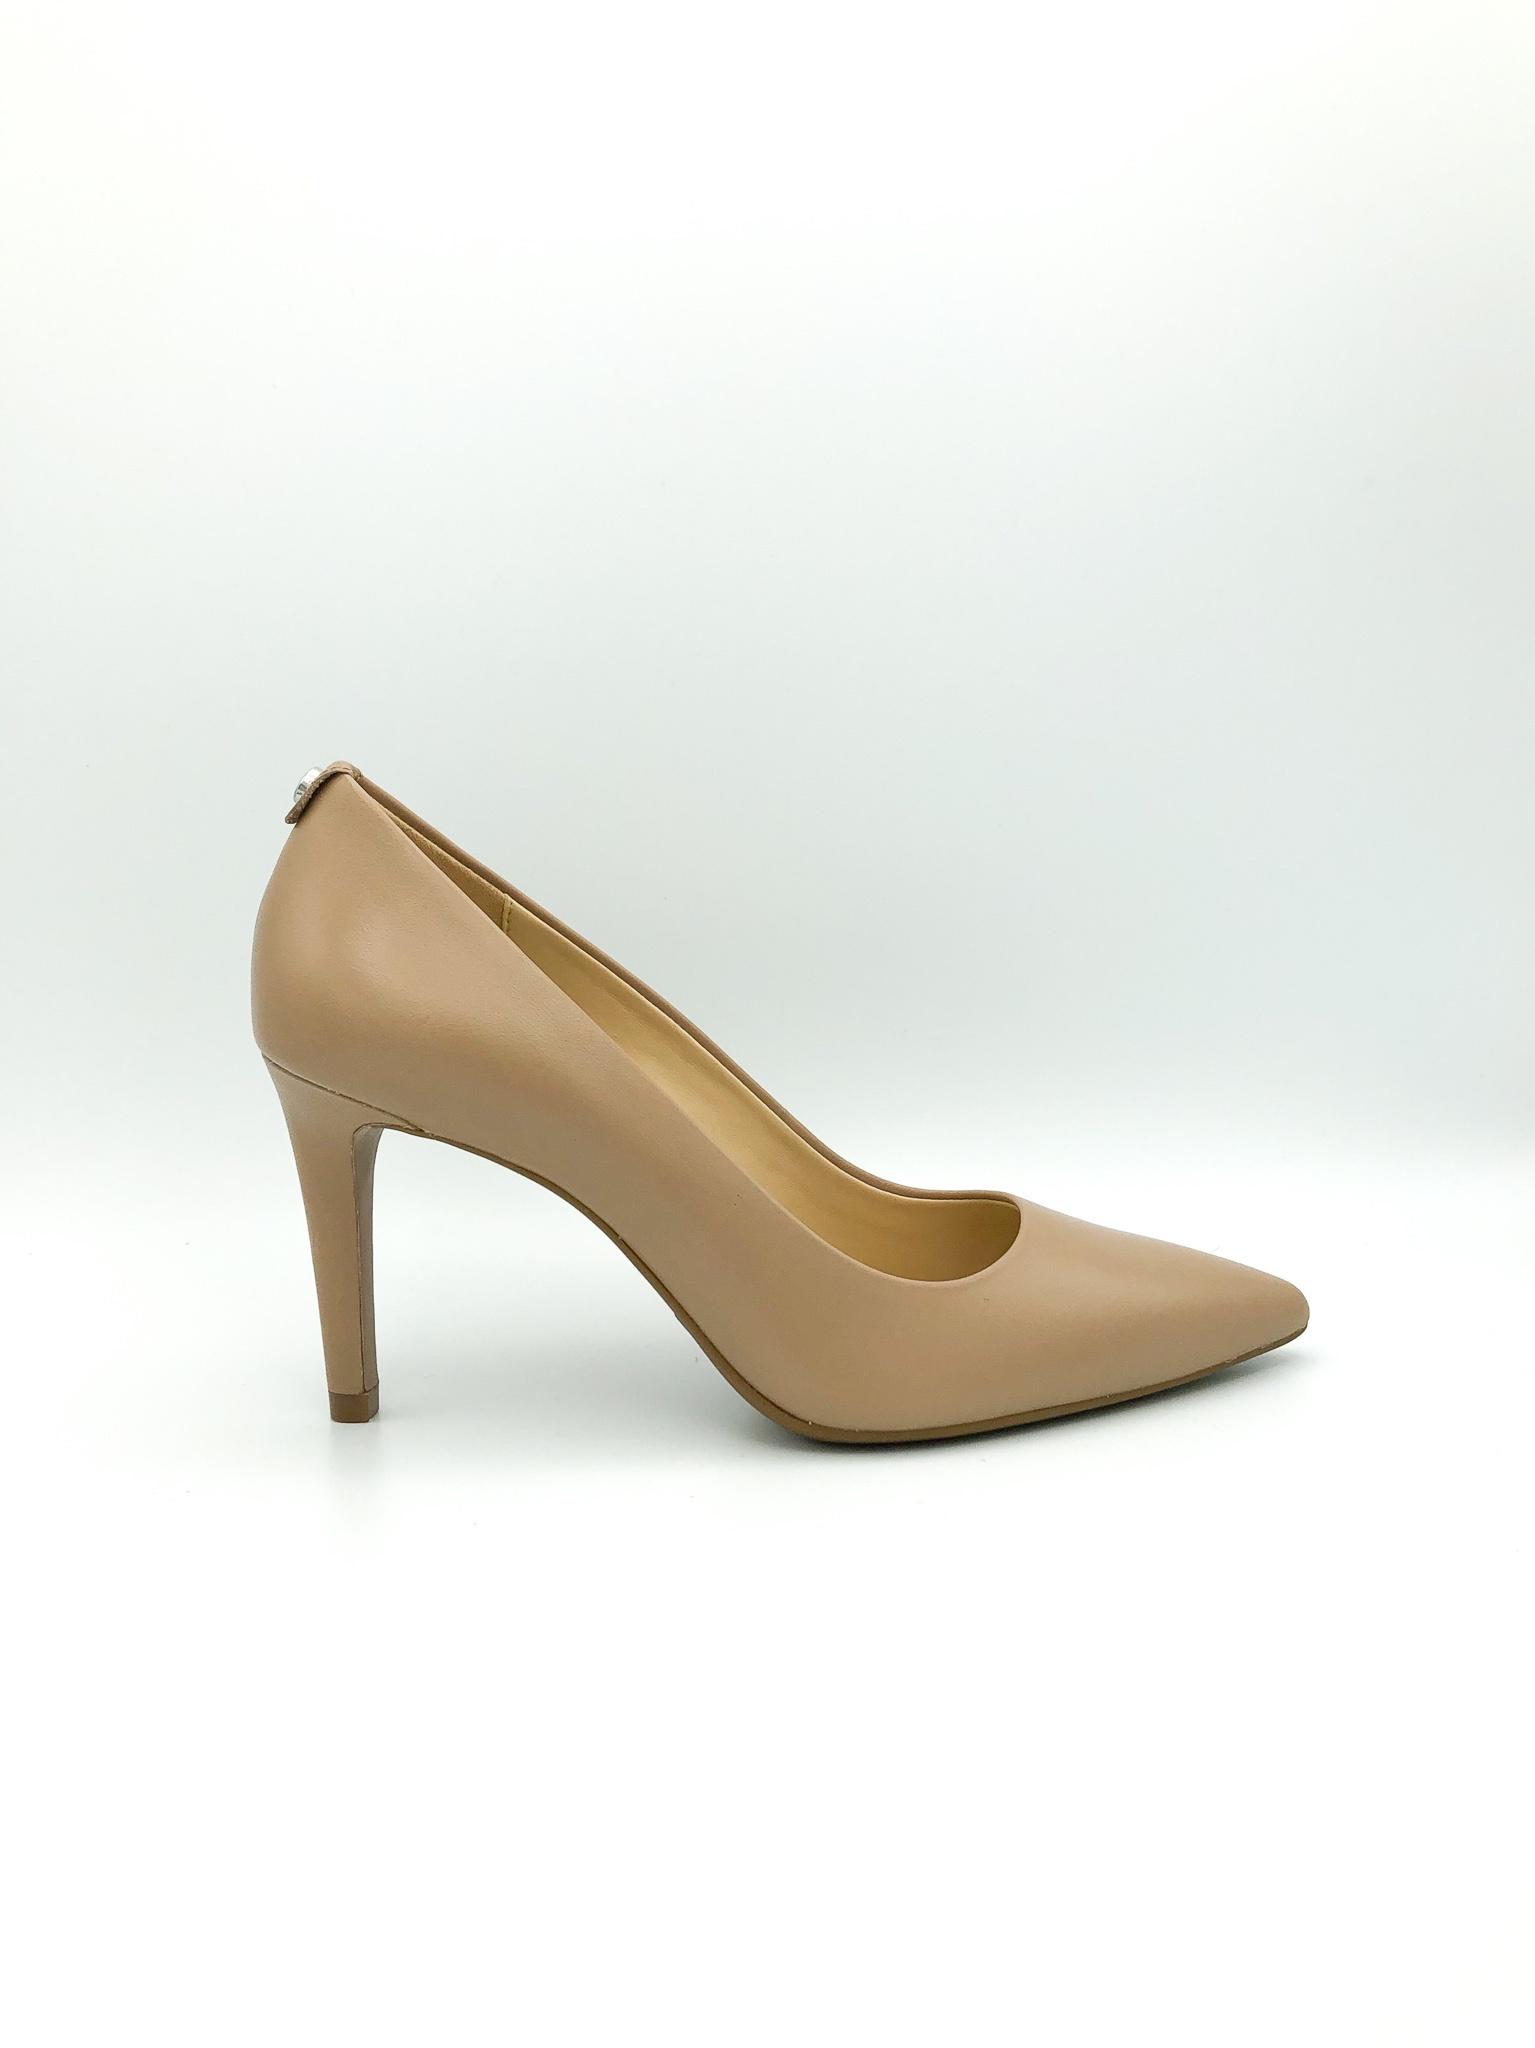 ea8fa666c714 MICHAEL KORS - DOROTHY FLEX PUMP IN DARK KHAKI - the Urban Shoe Myth